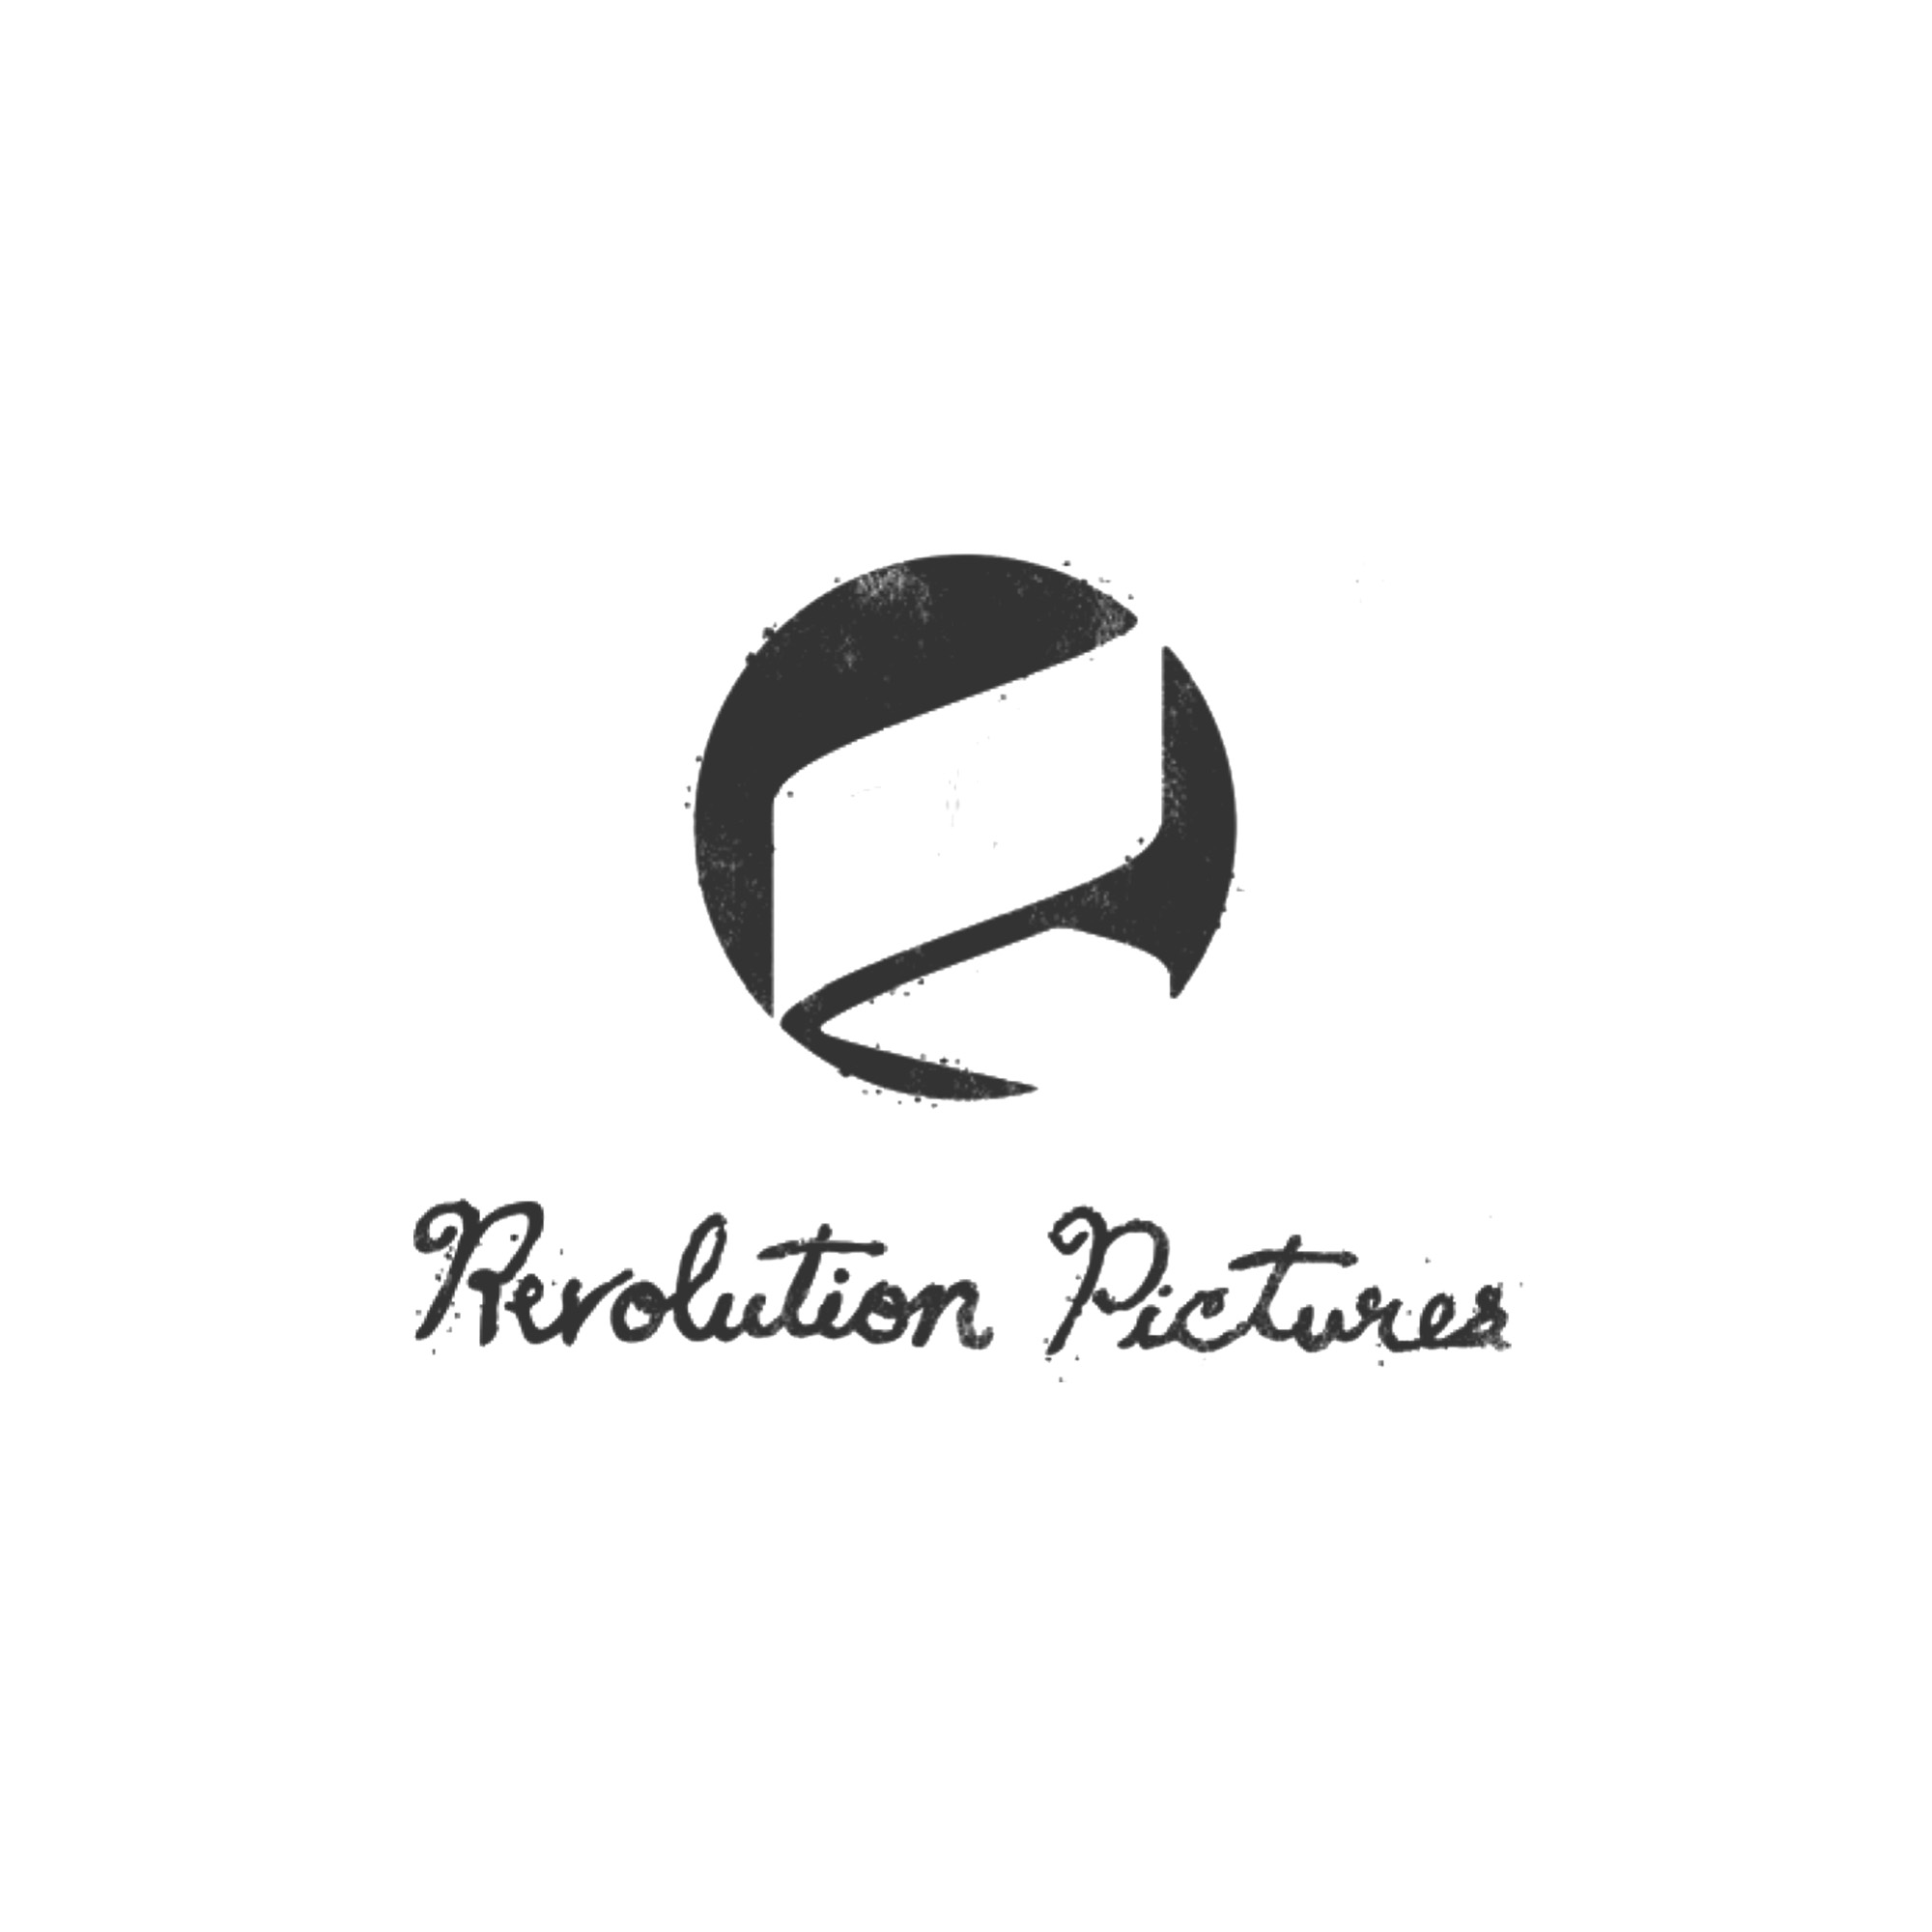 ajr-logos-007-RevolutionPictures